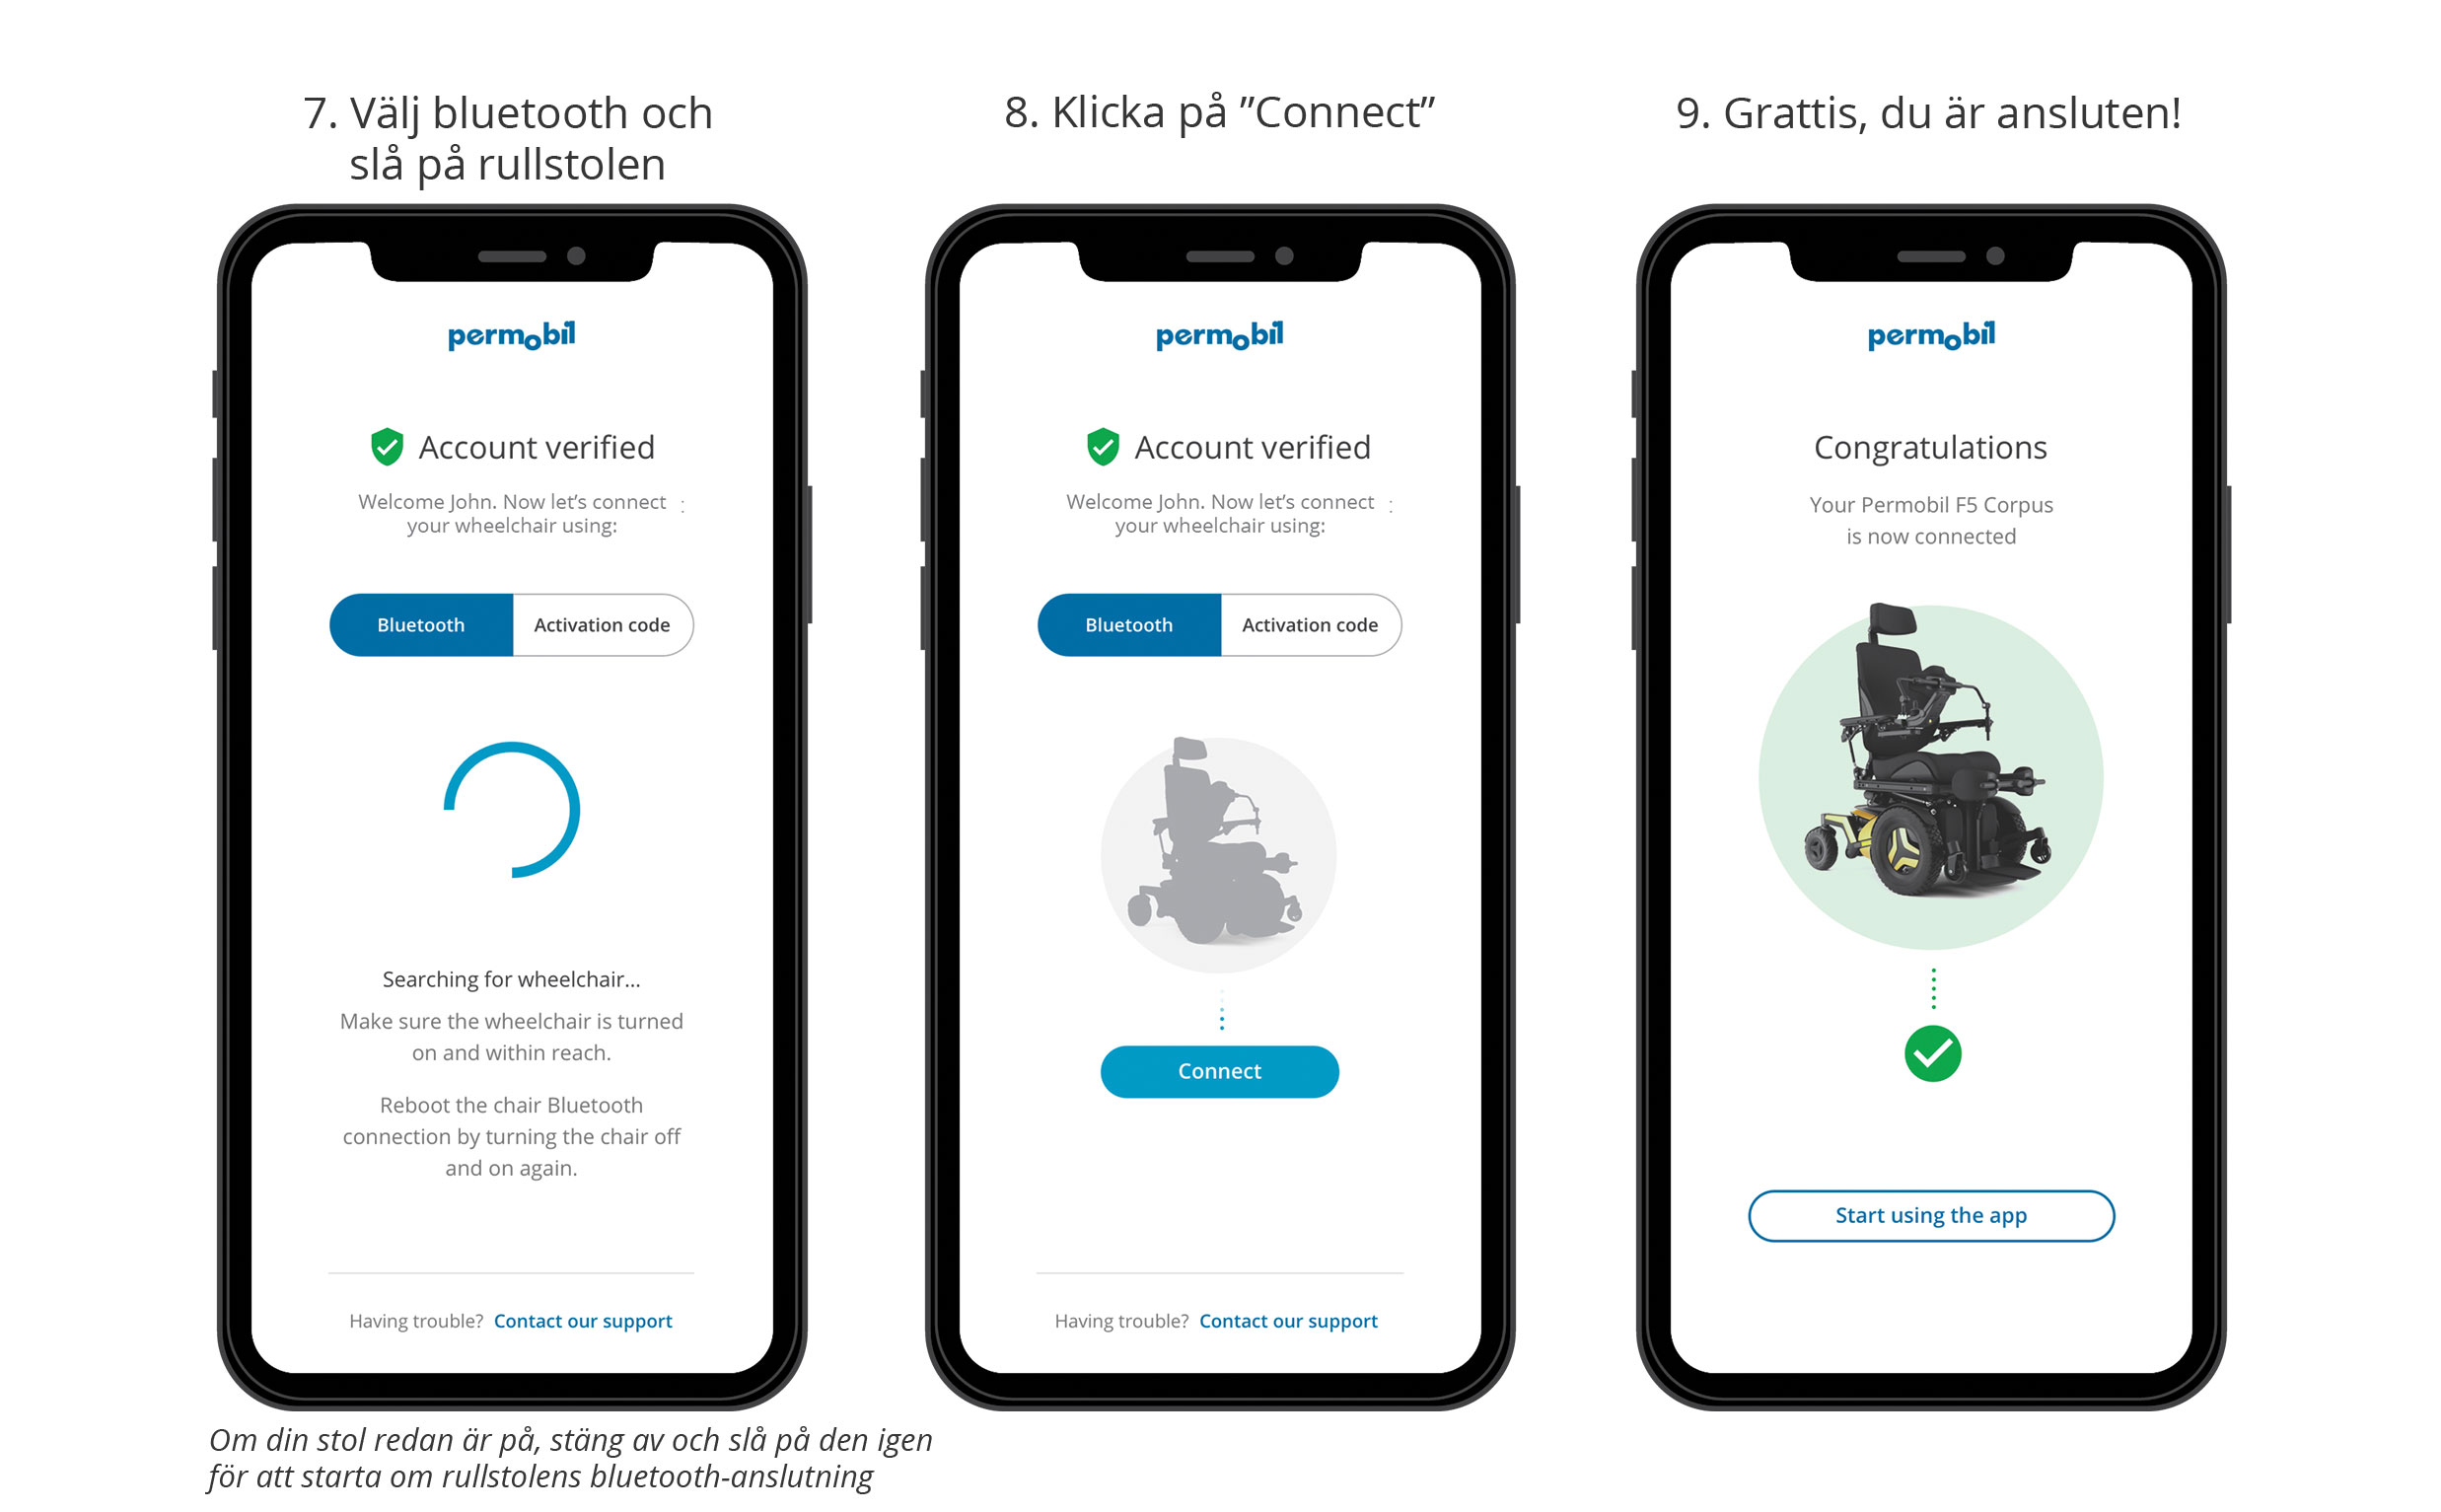 MyPermobil---Activation-Steps-7-9_SE